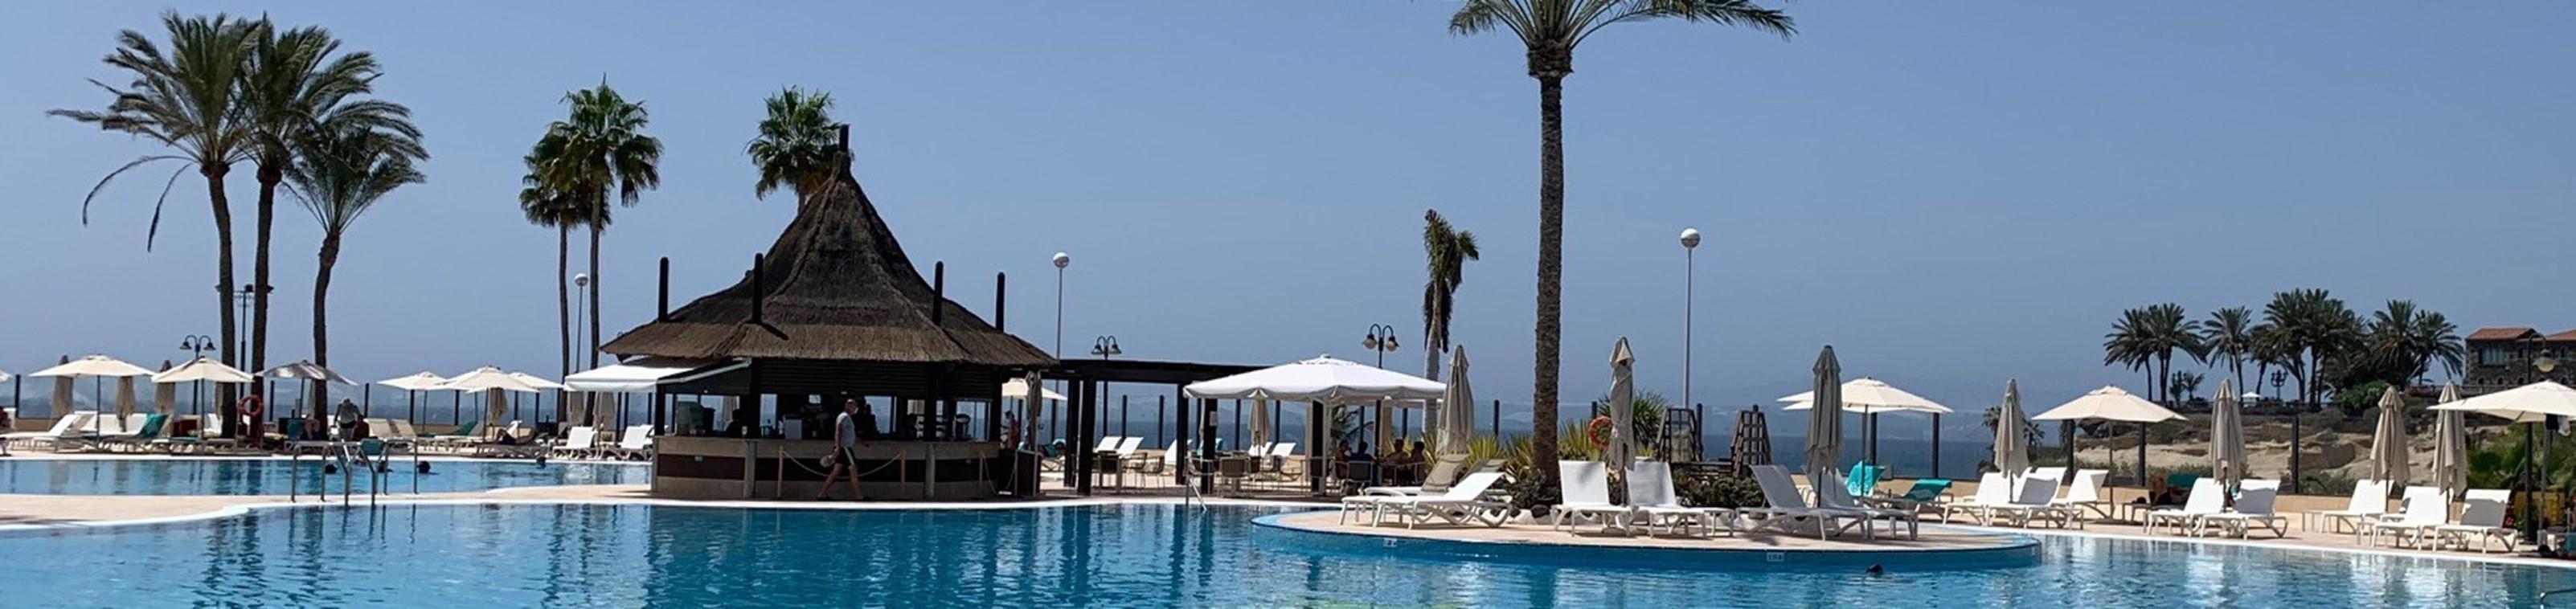 5* Iberostar Luxe Familiehotel in Costa Adeje (Tenerife)